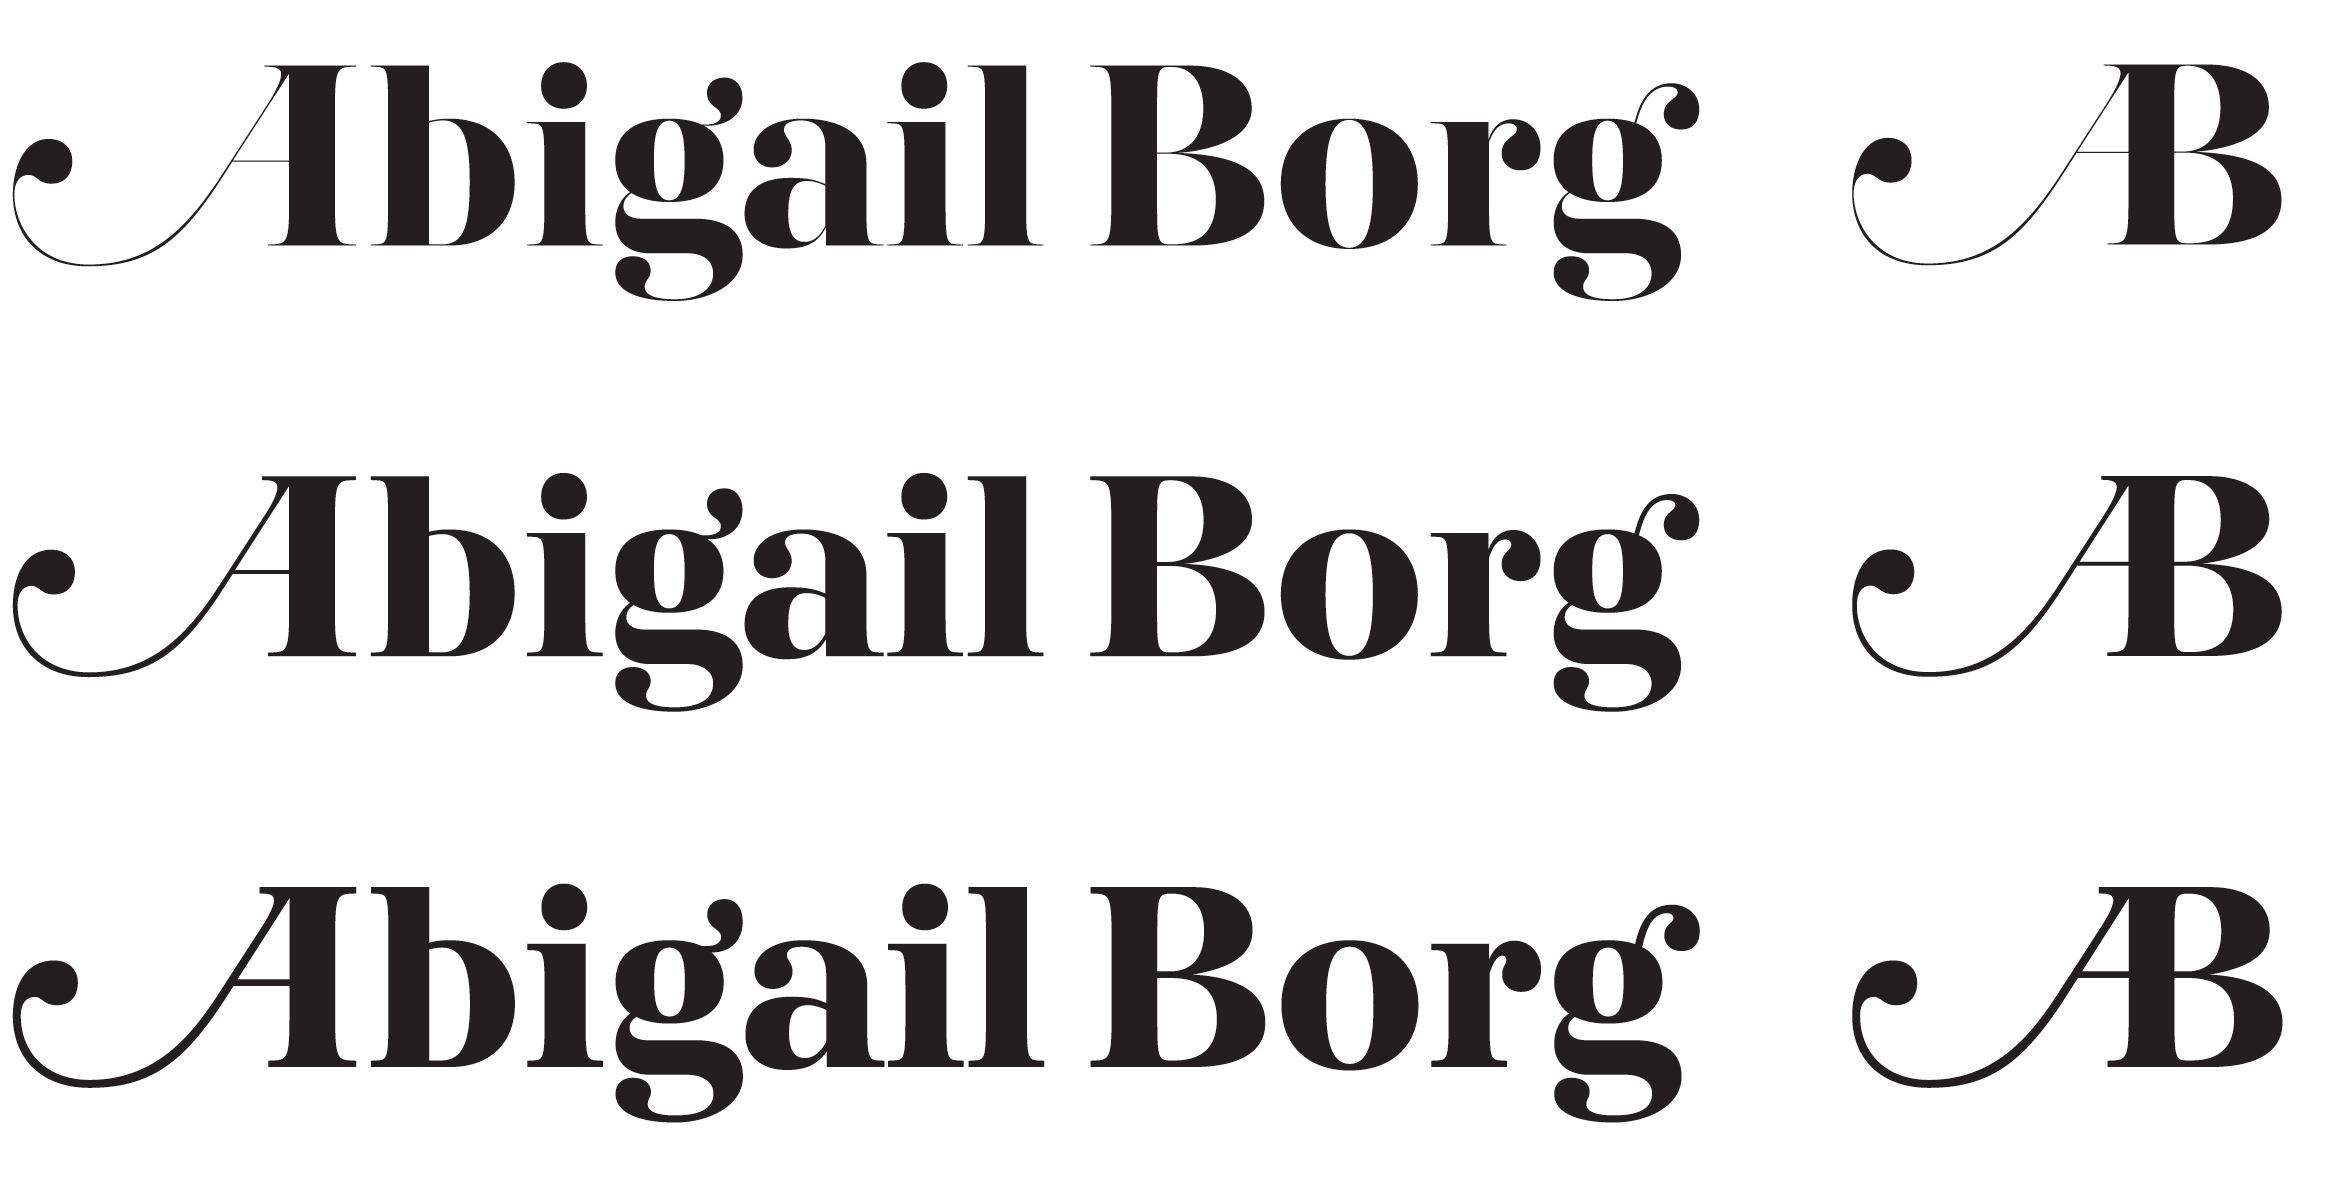 Abigailborg threeversions2011